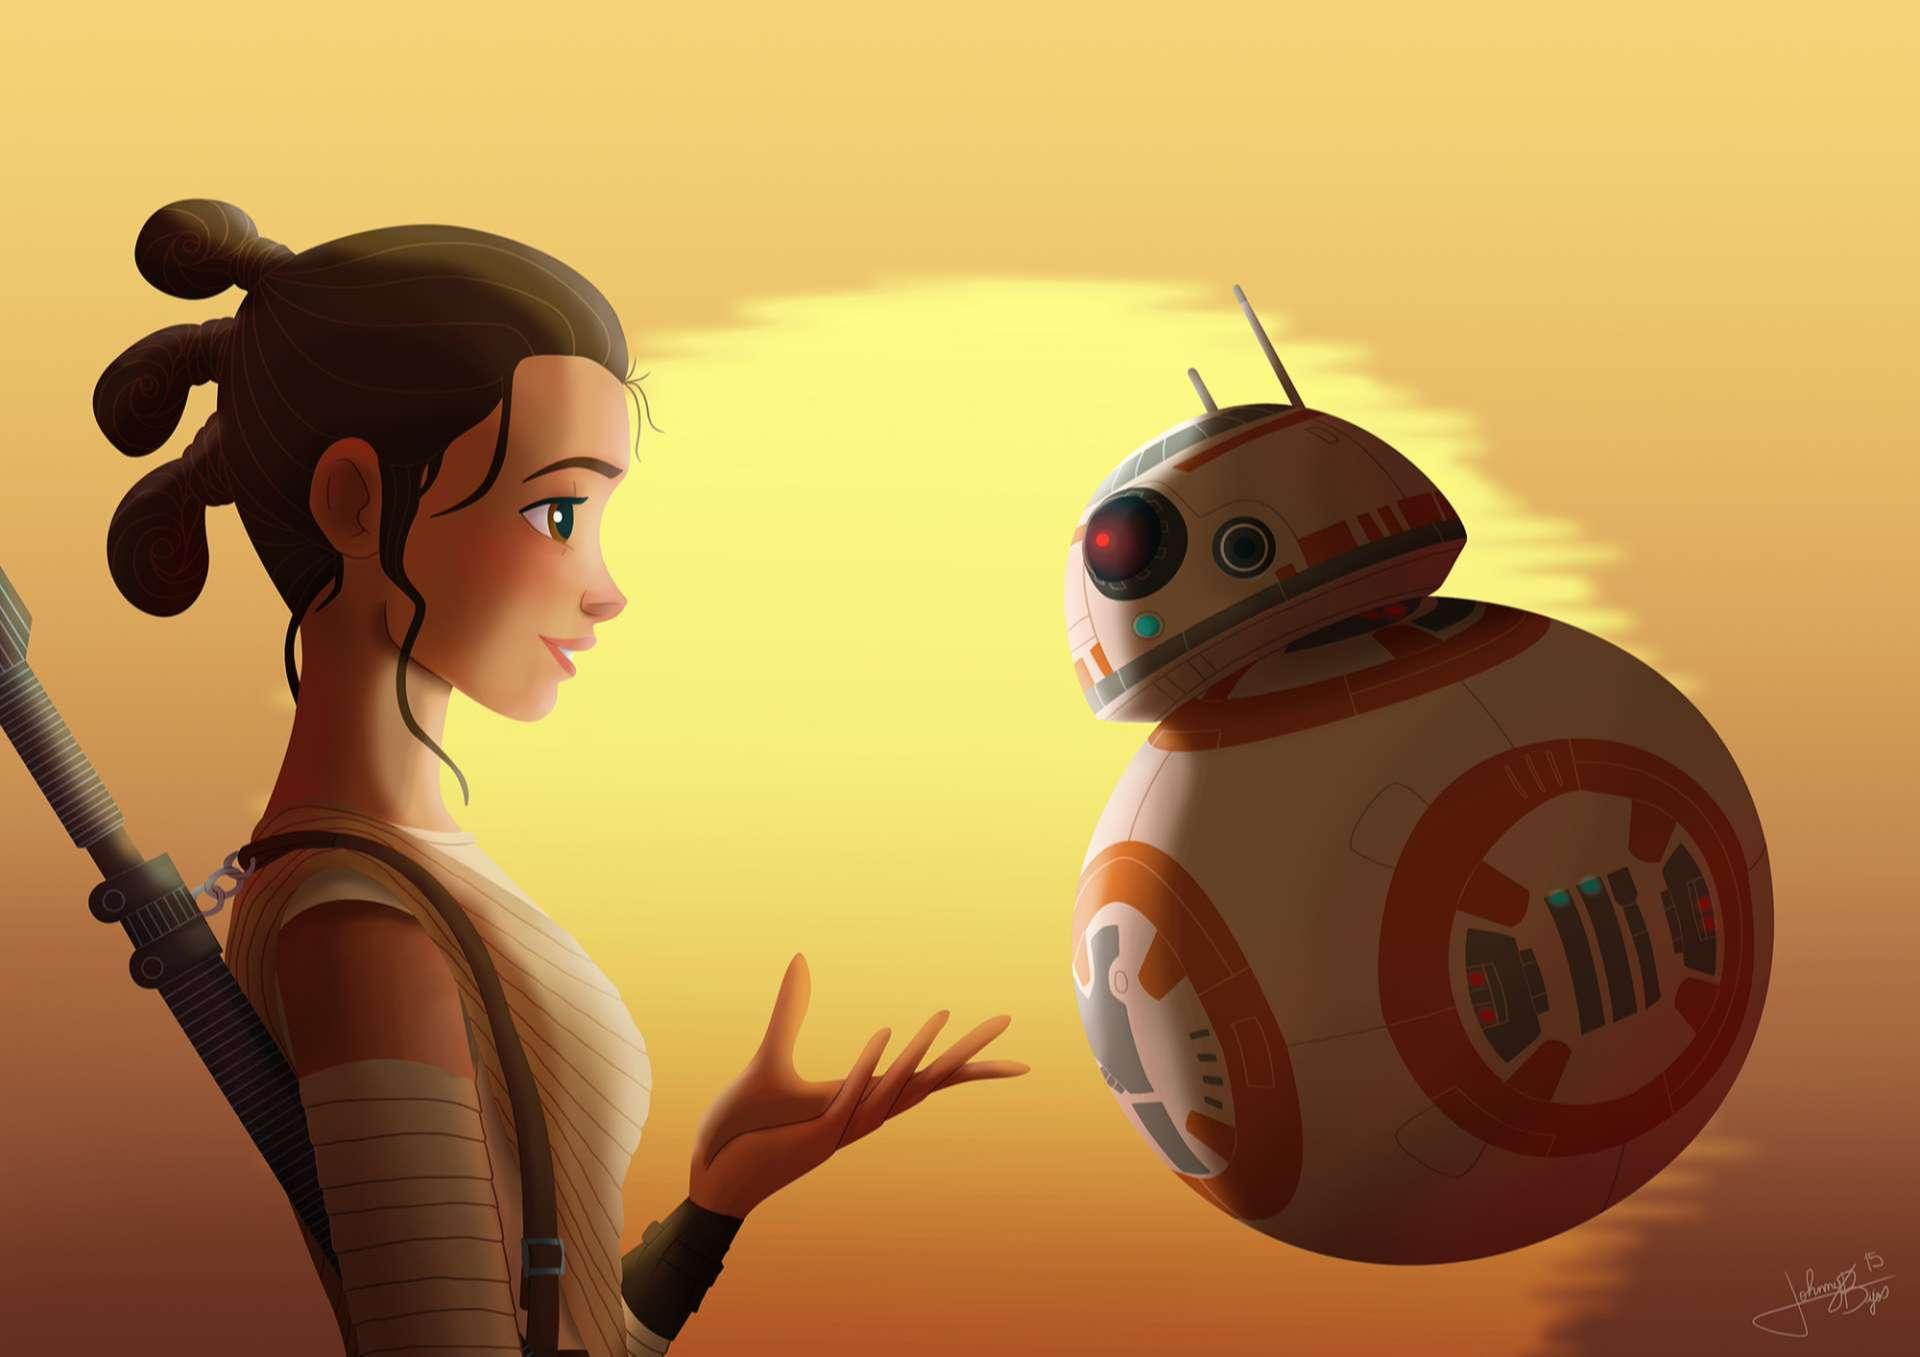 Star Wars Episode VII The Force Awakens Wallpaper 023